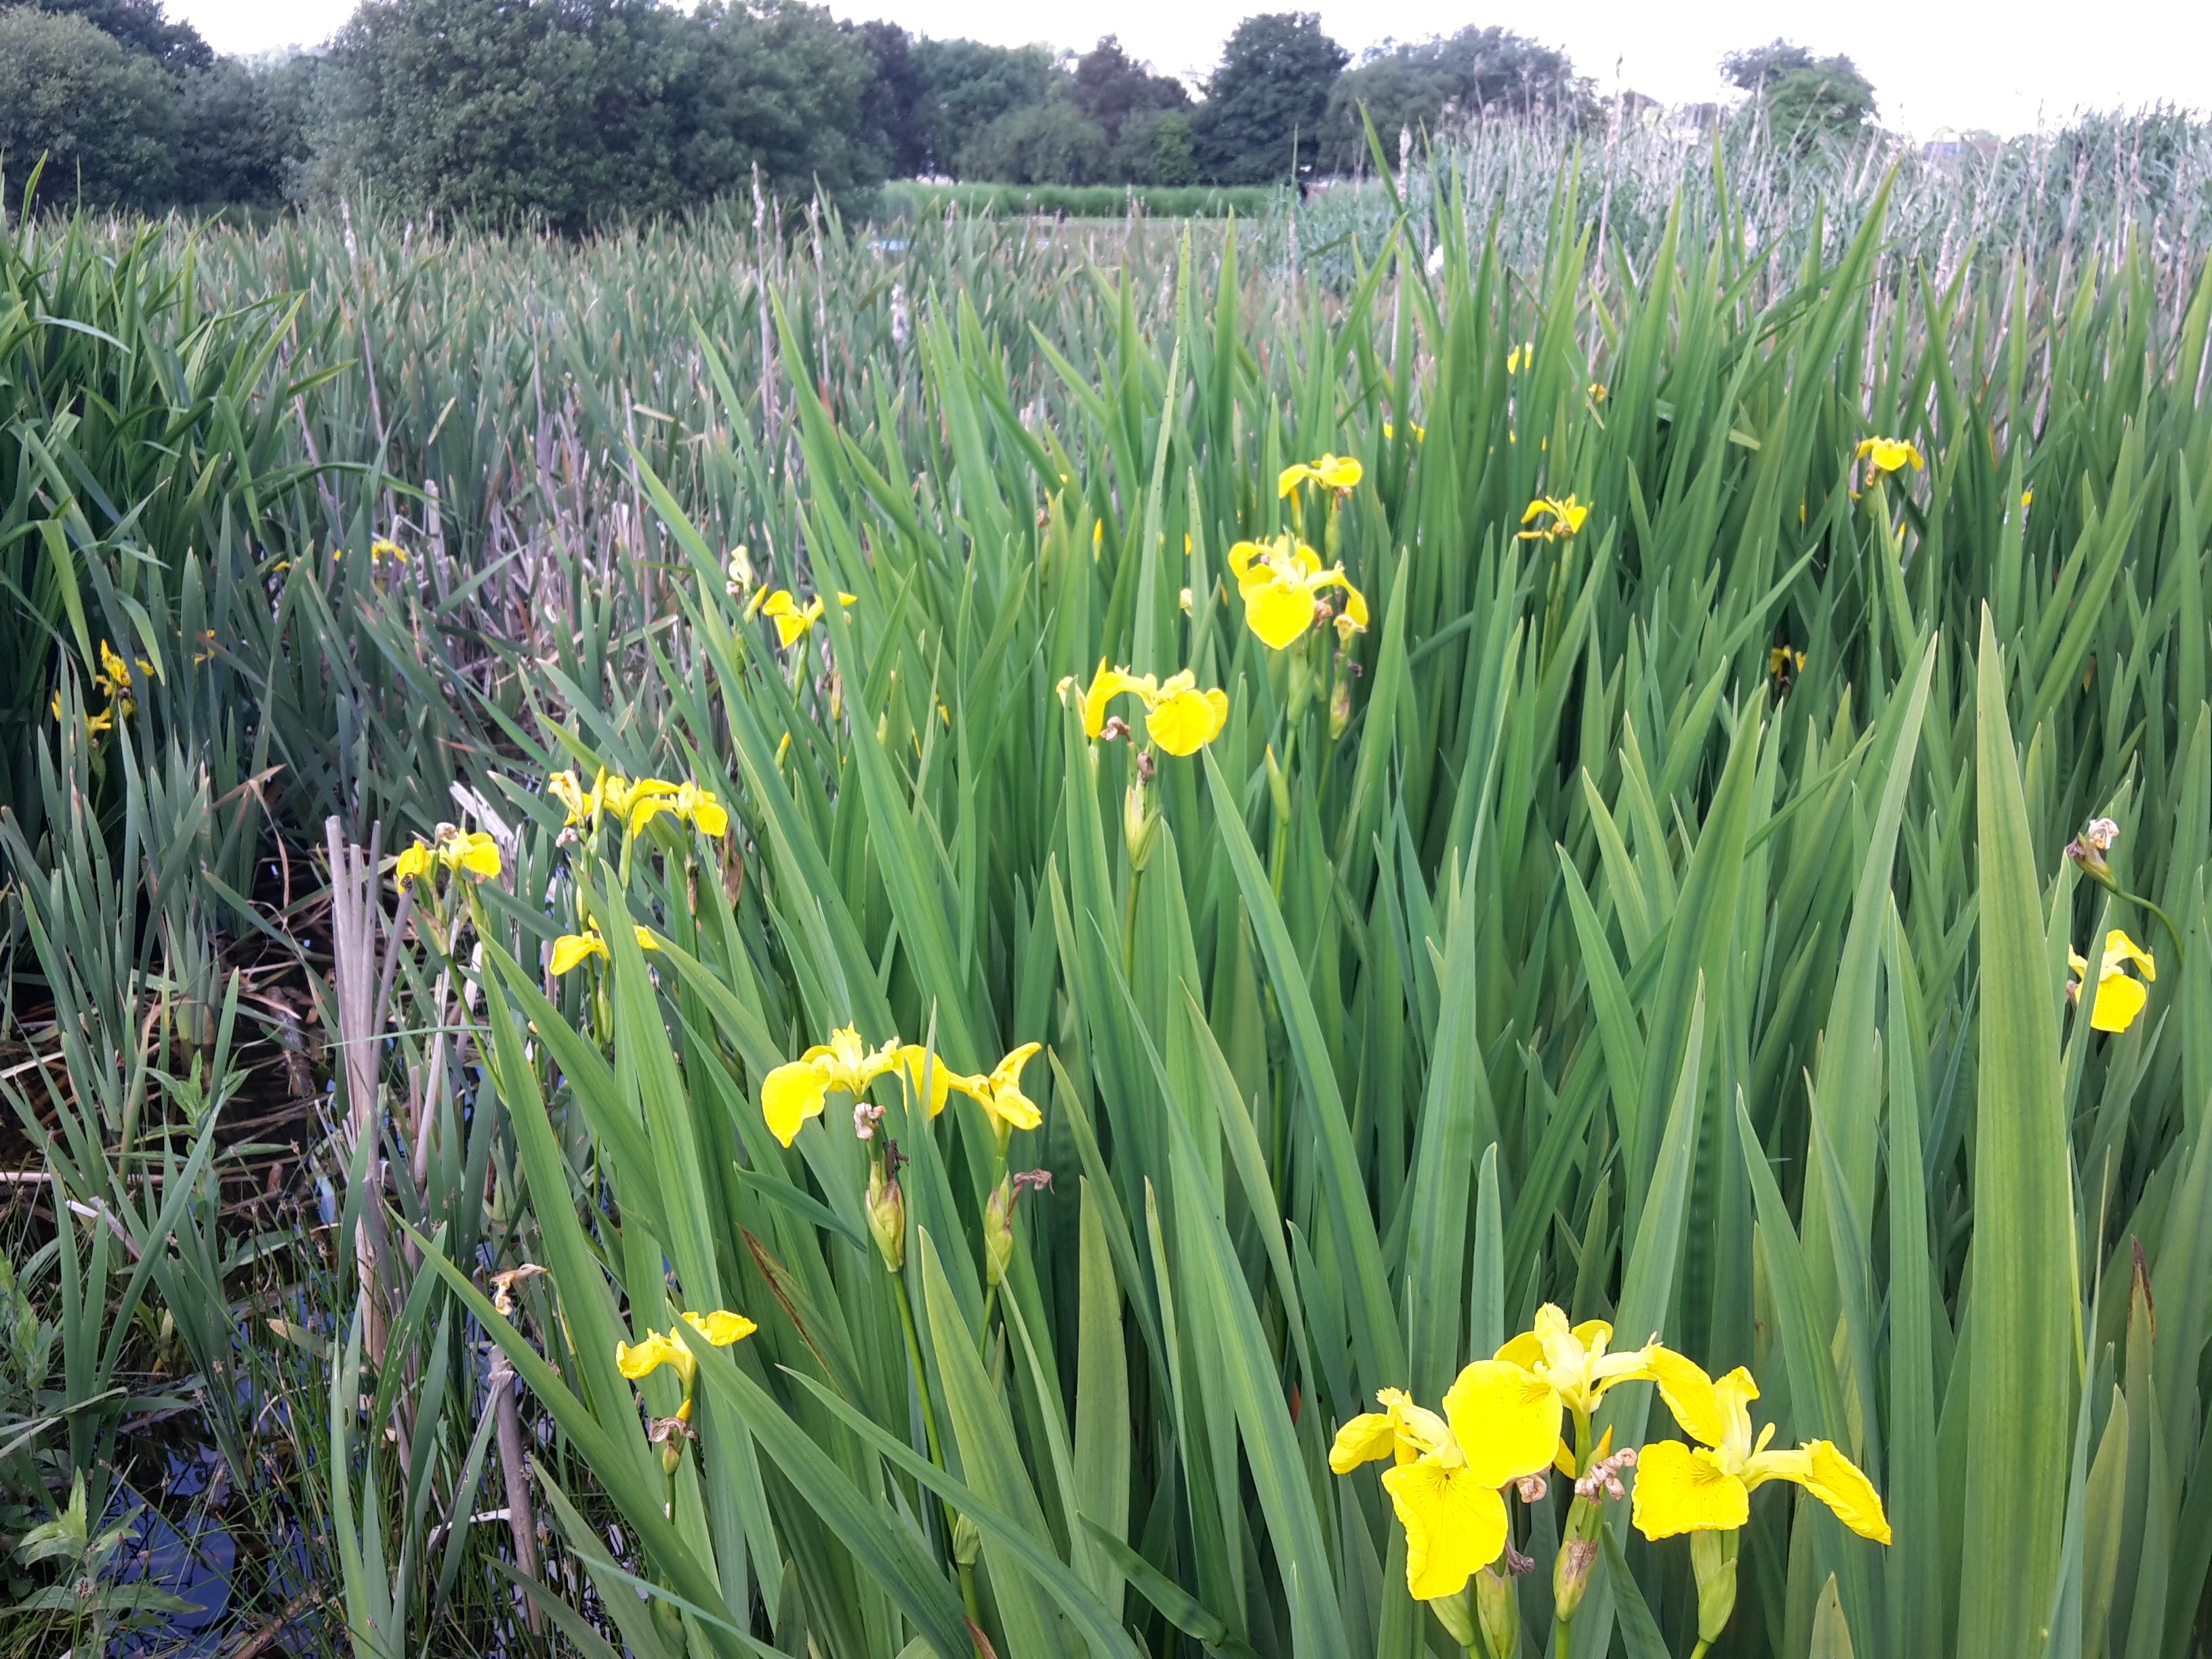 East Common Tayport  Flag Iris growing in pond